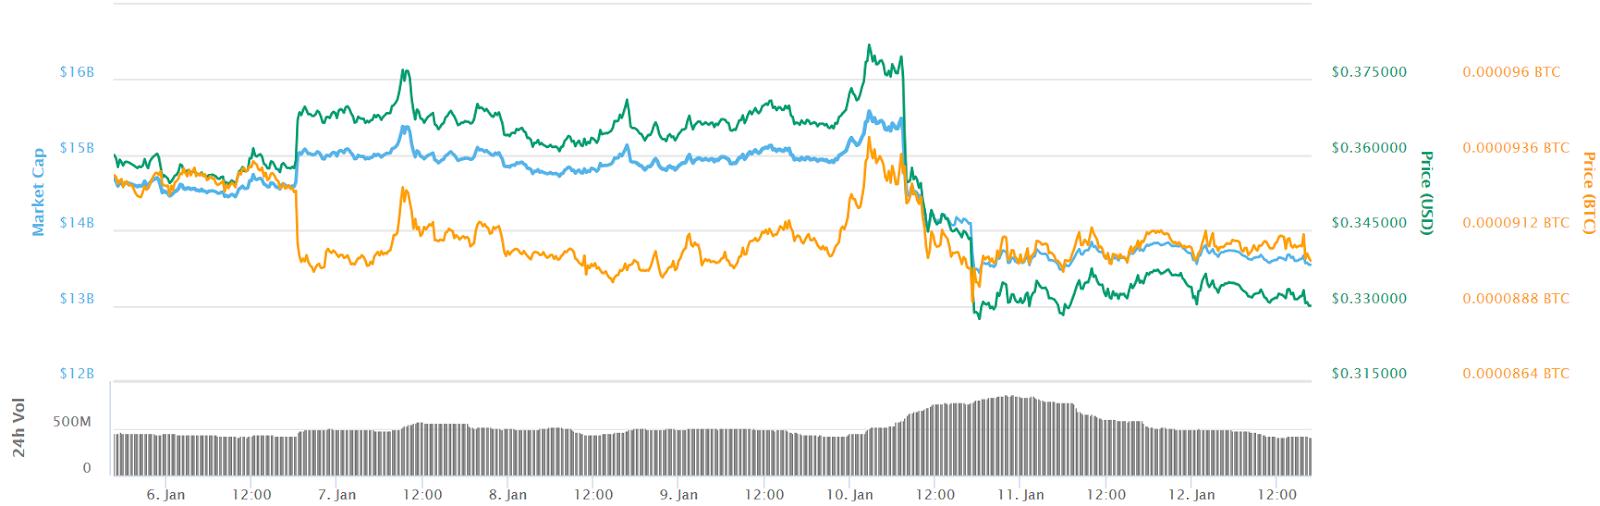 7 days price chart ripple